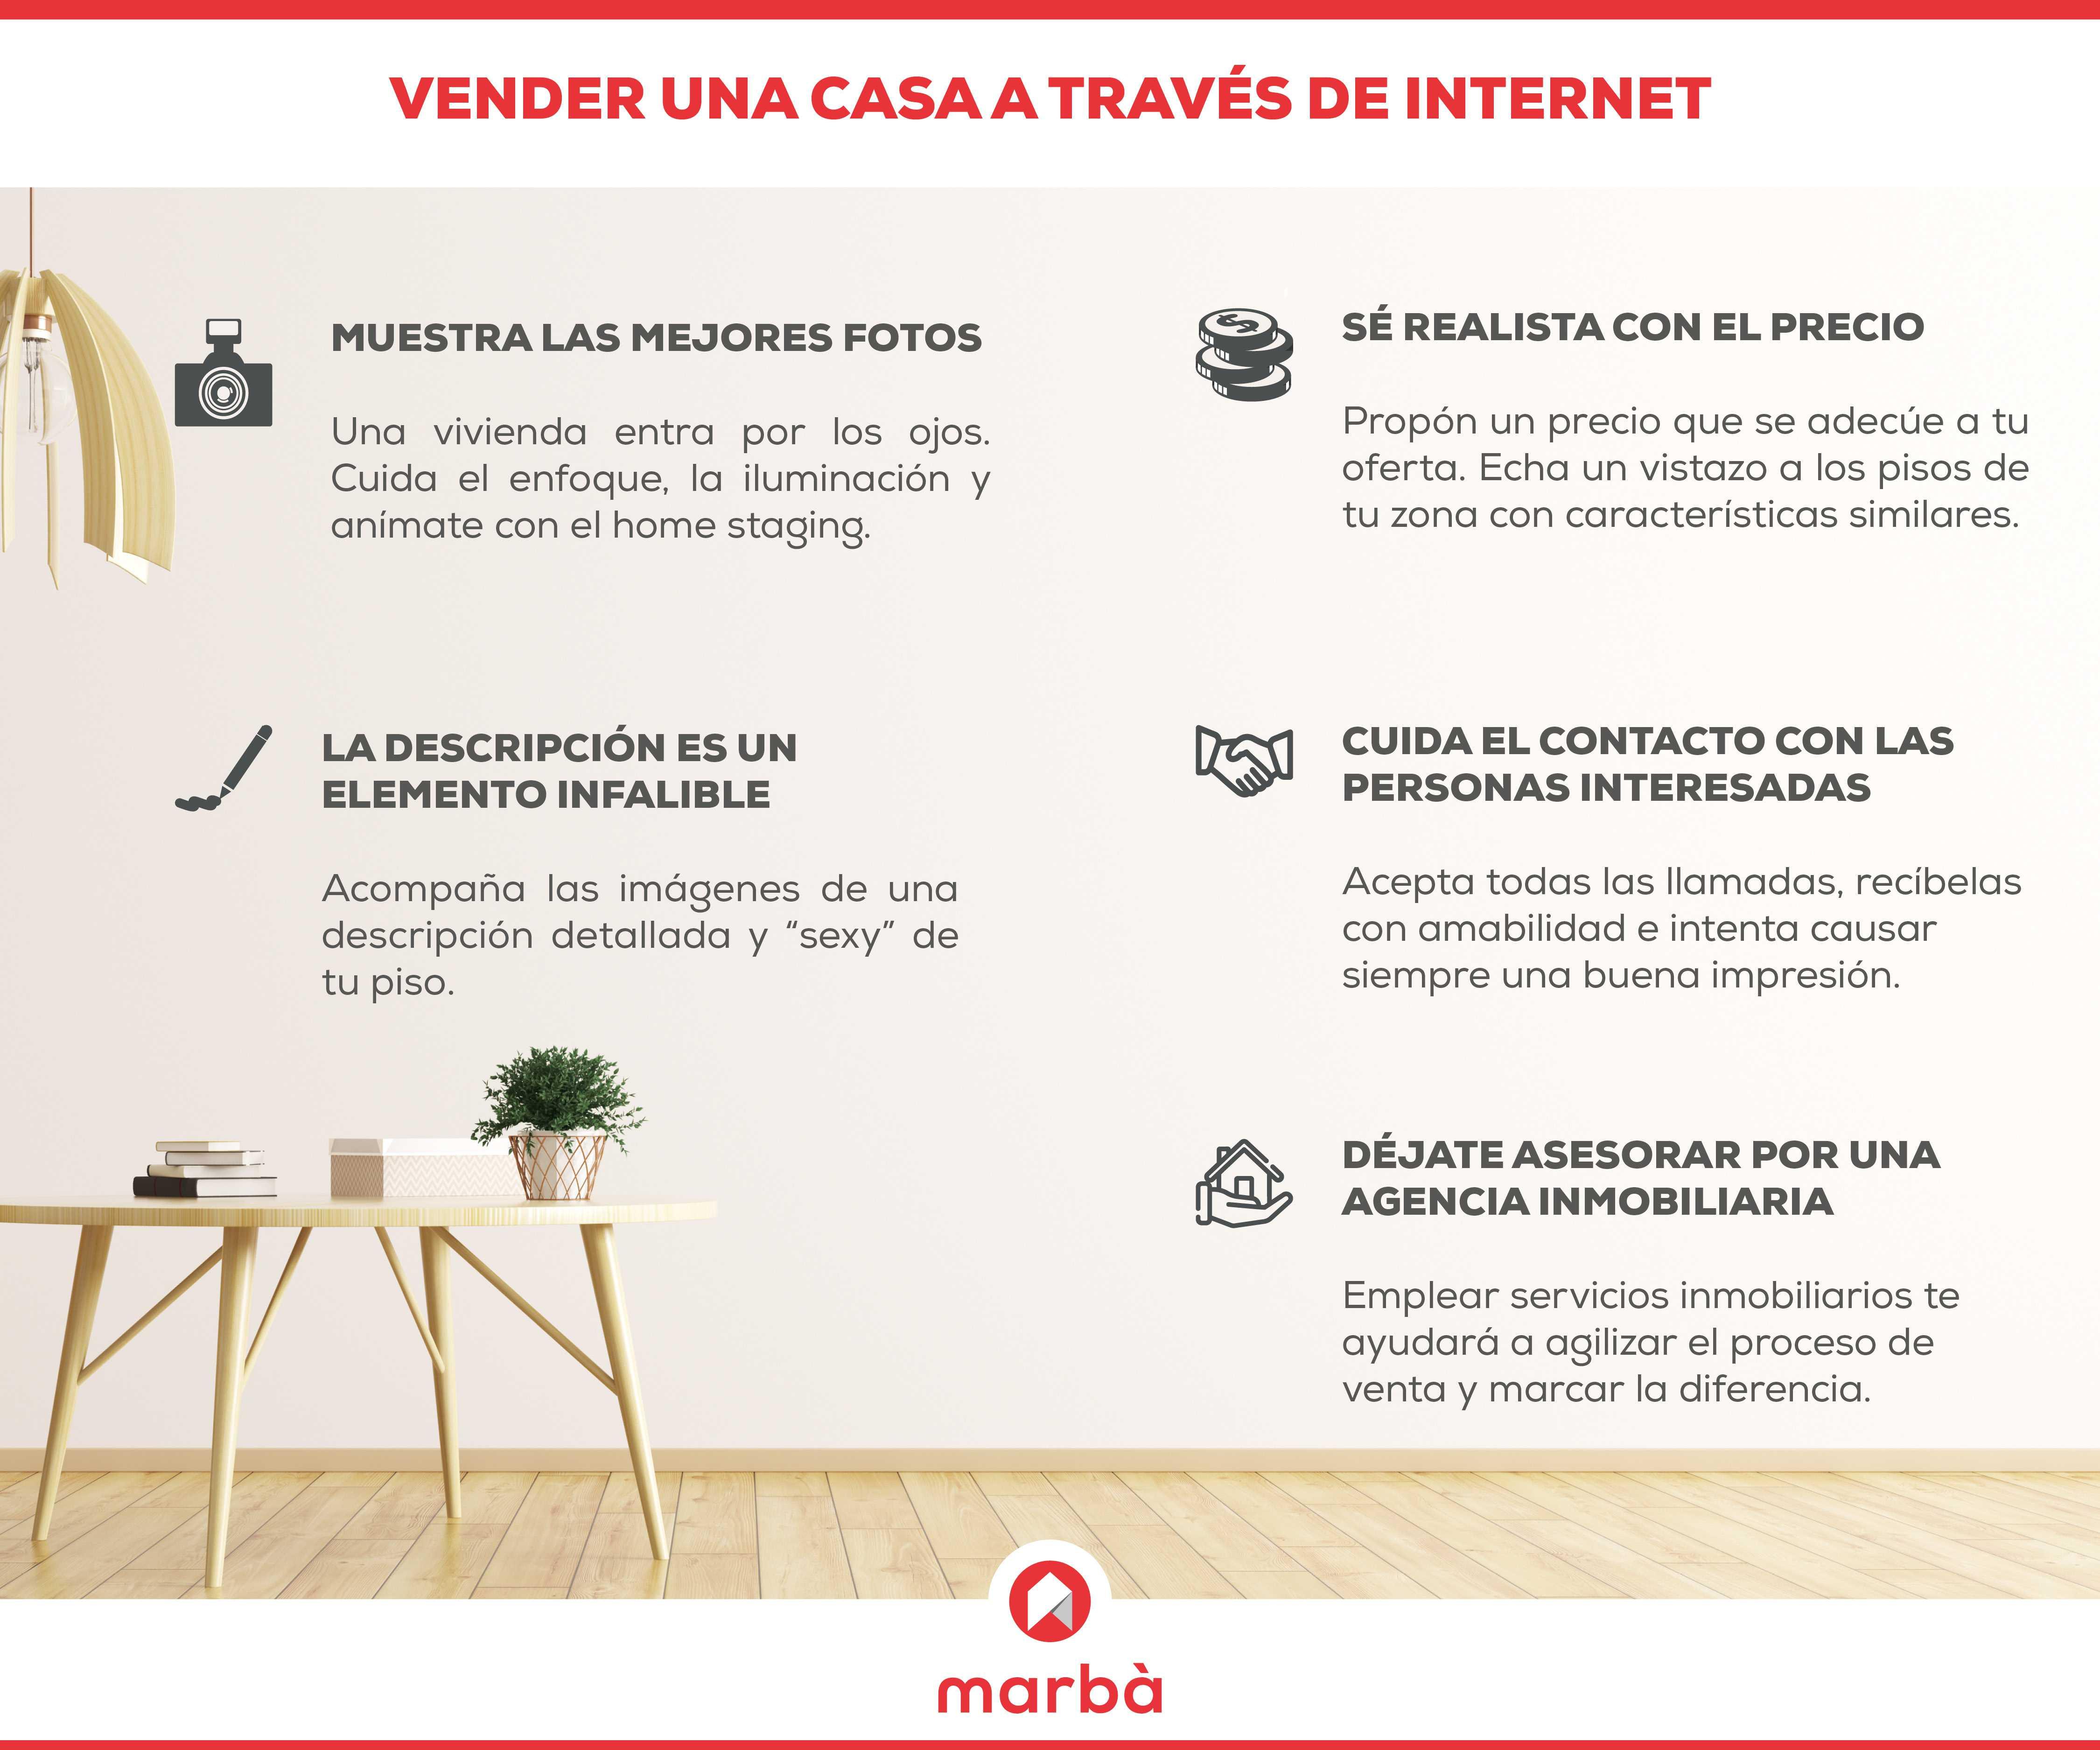 5 consejos vender casa por Internet | Marbà